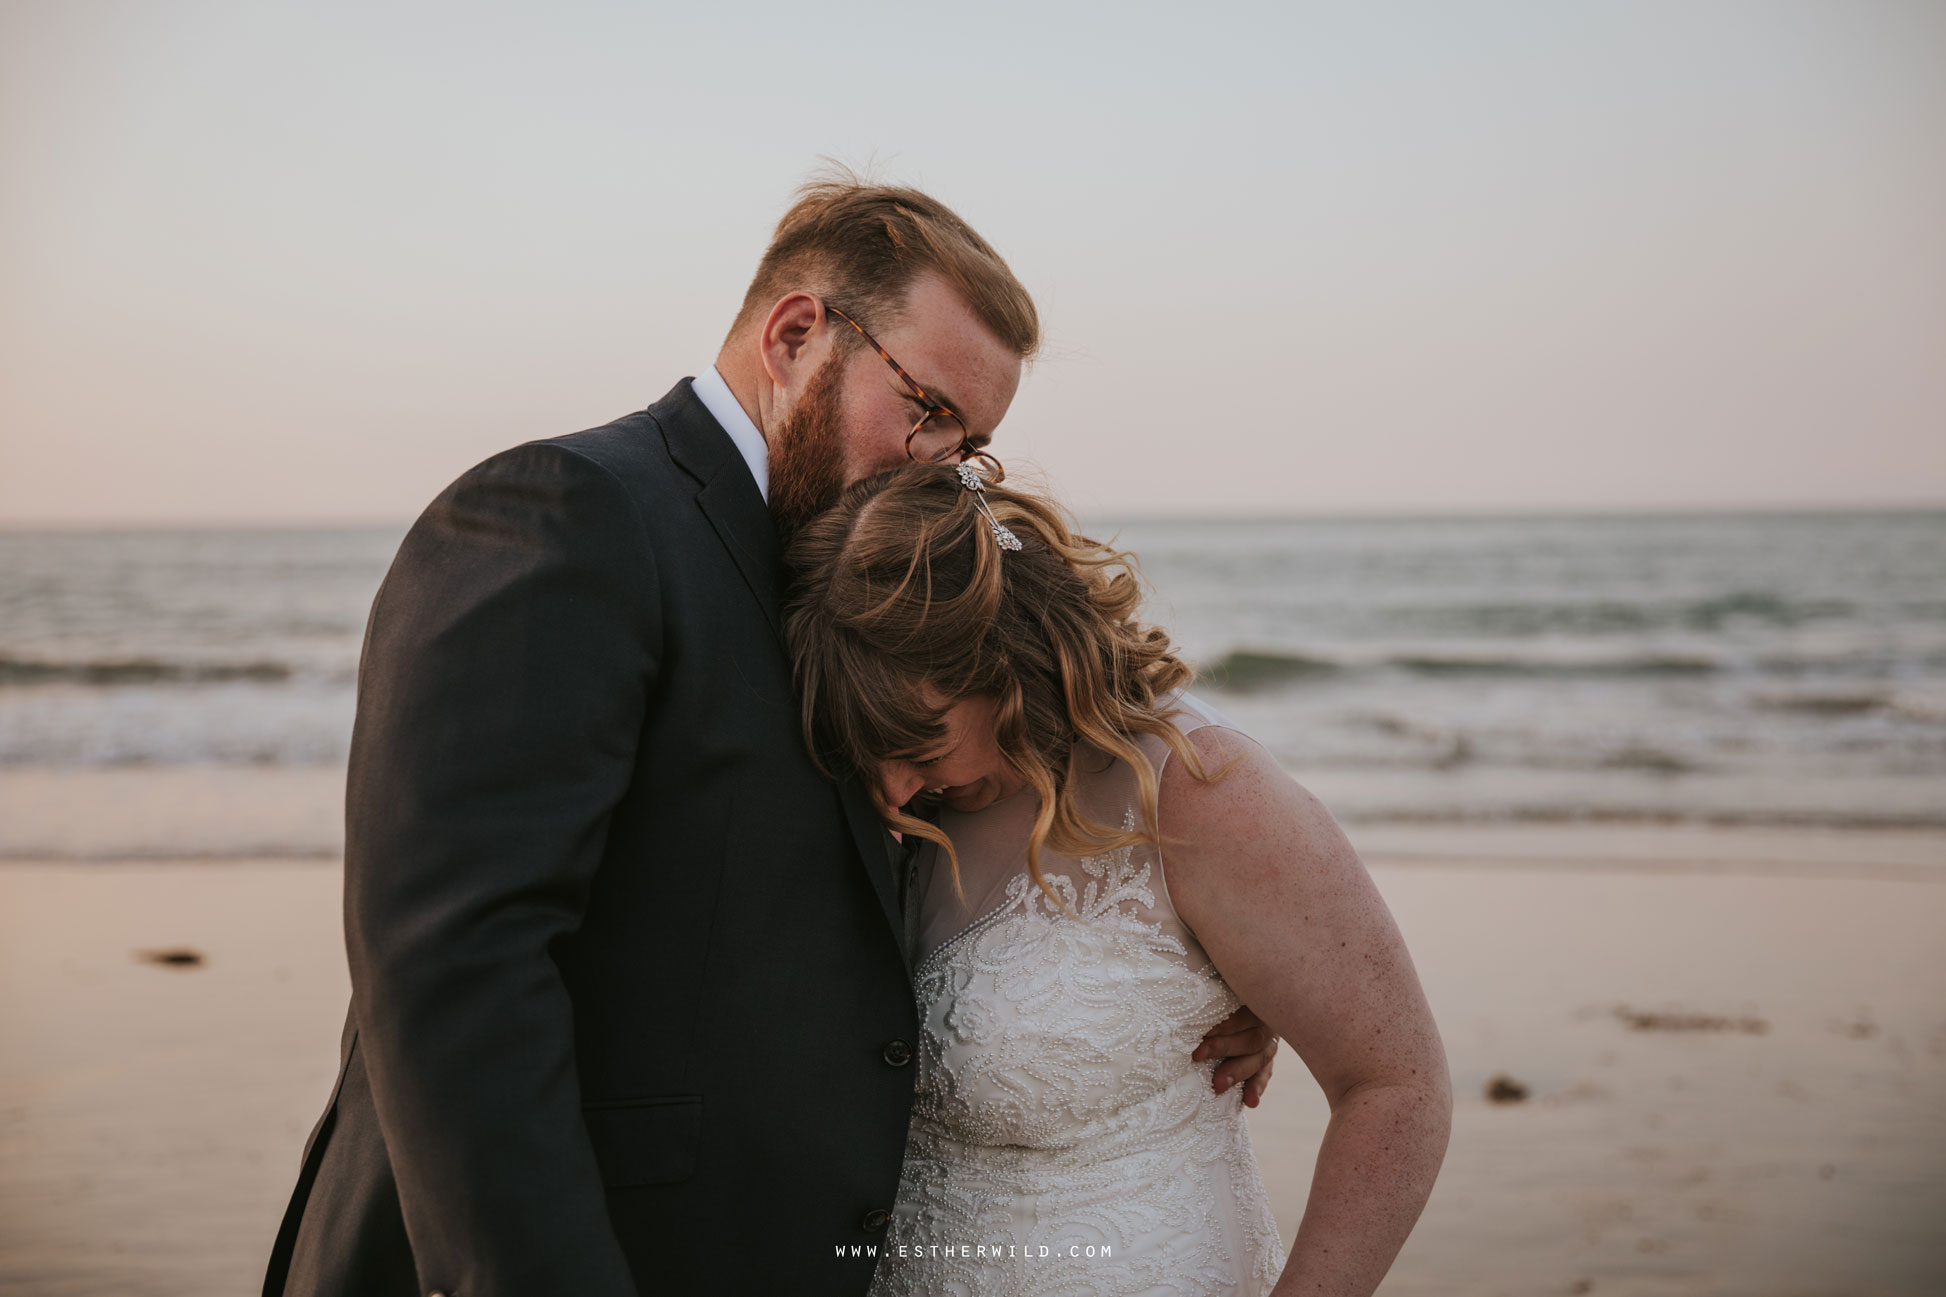 Cromer_Wedding_Beach_Outdoor_Ceremony_Norfolk_North_Lodge_Registry_Office_Rocket_House_Cafe_Cromer_Pier_IMG_5037.jpg